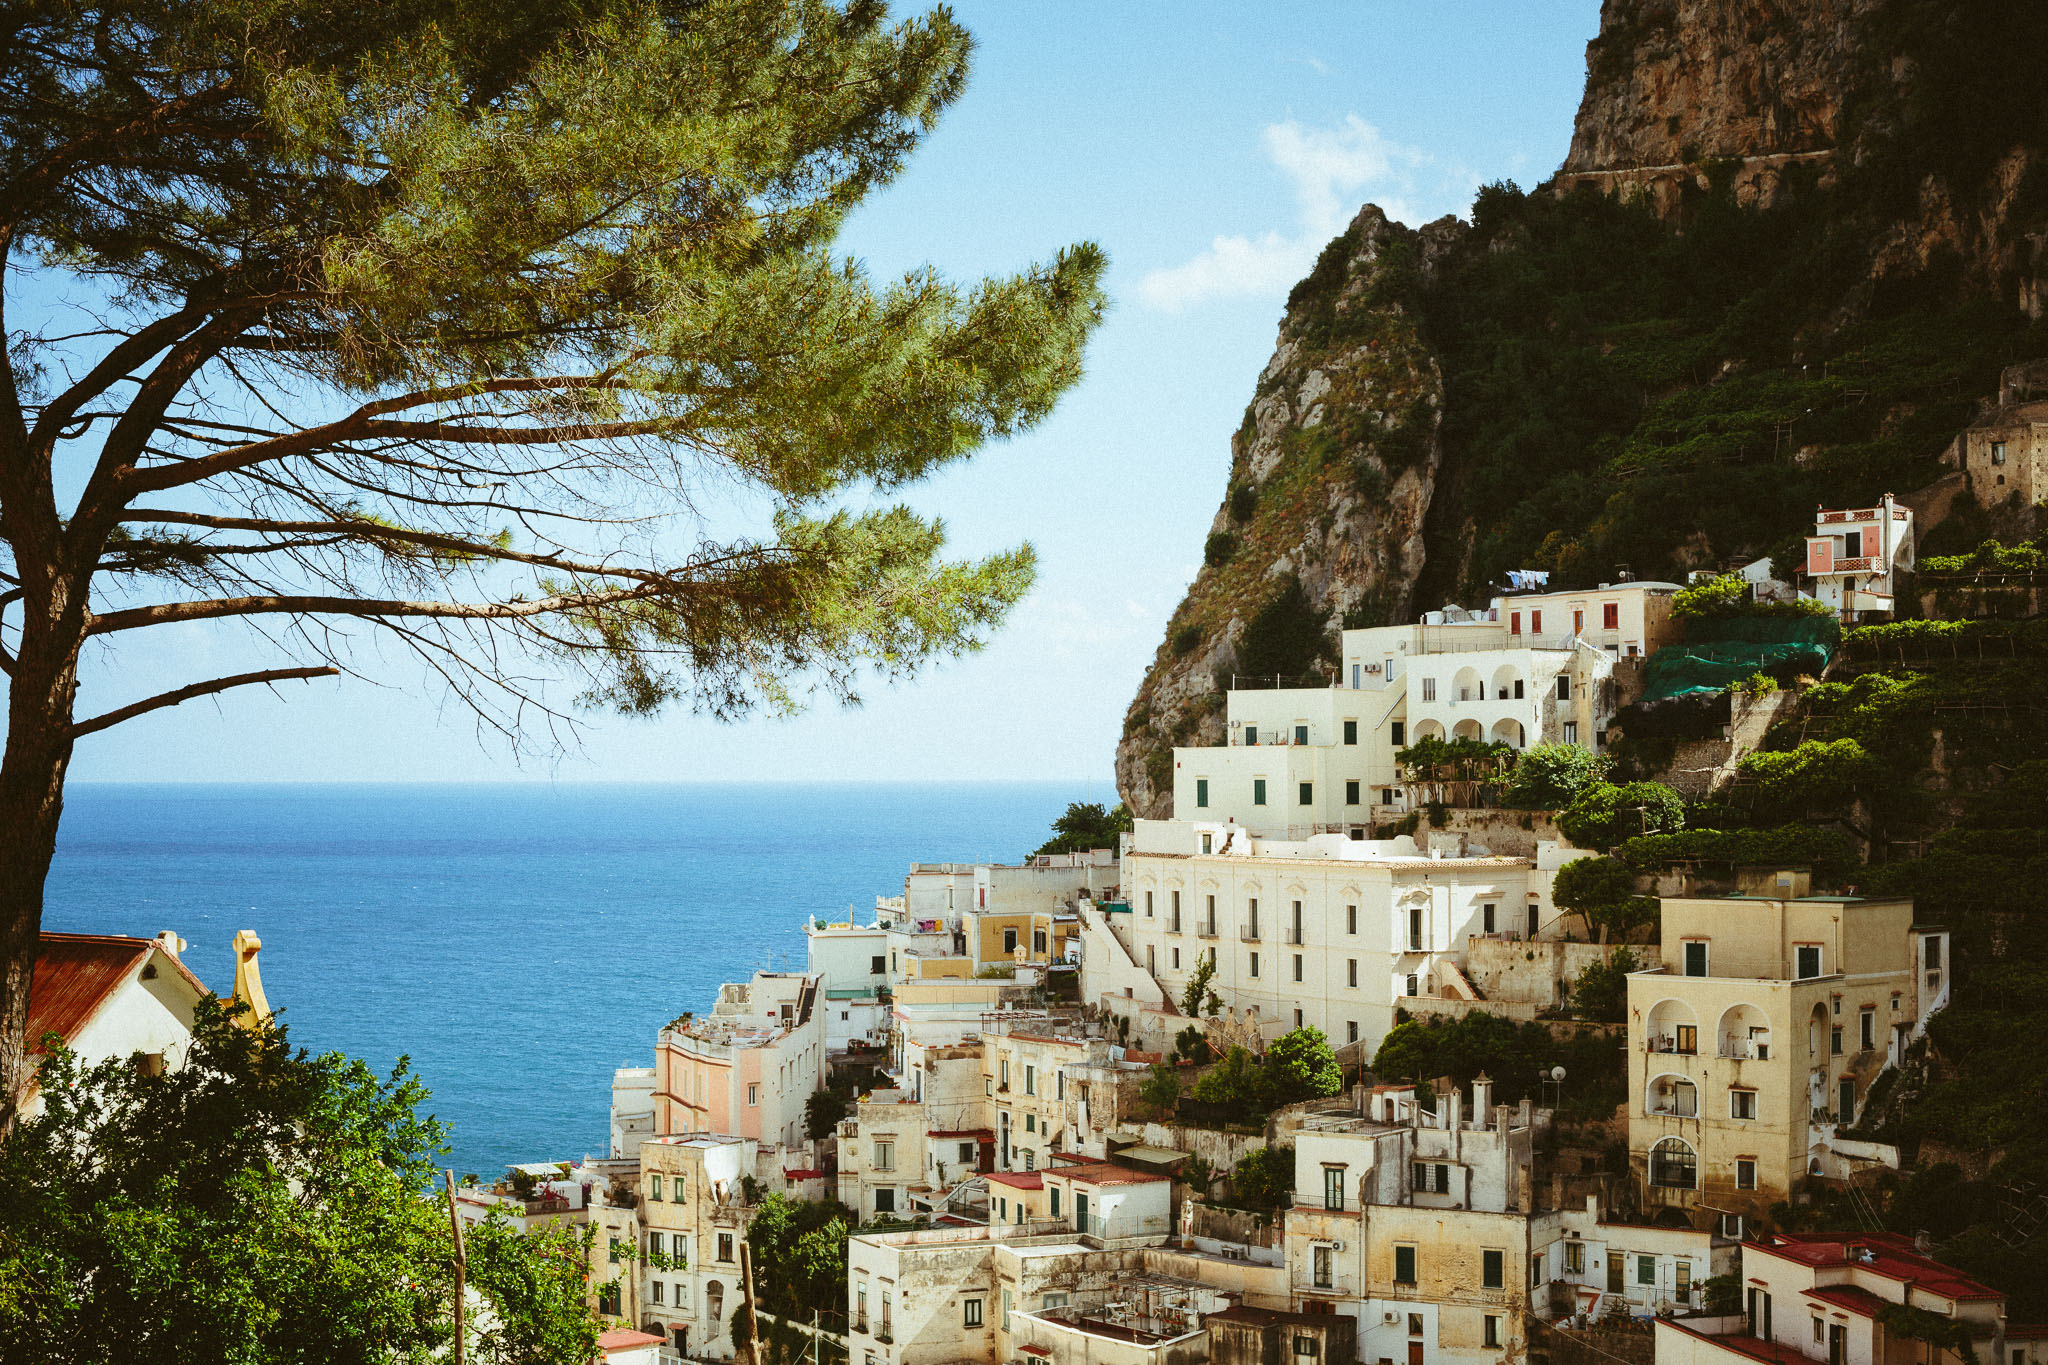 Italy_20130526_2.jpg